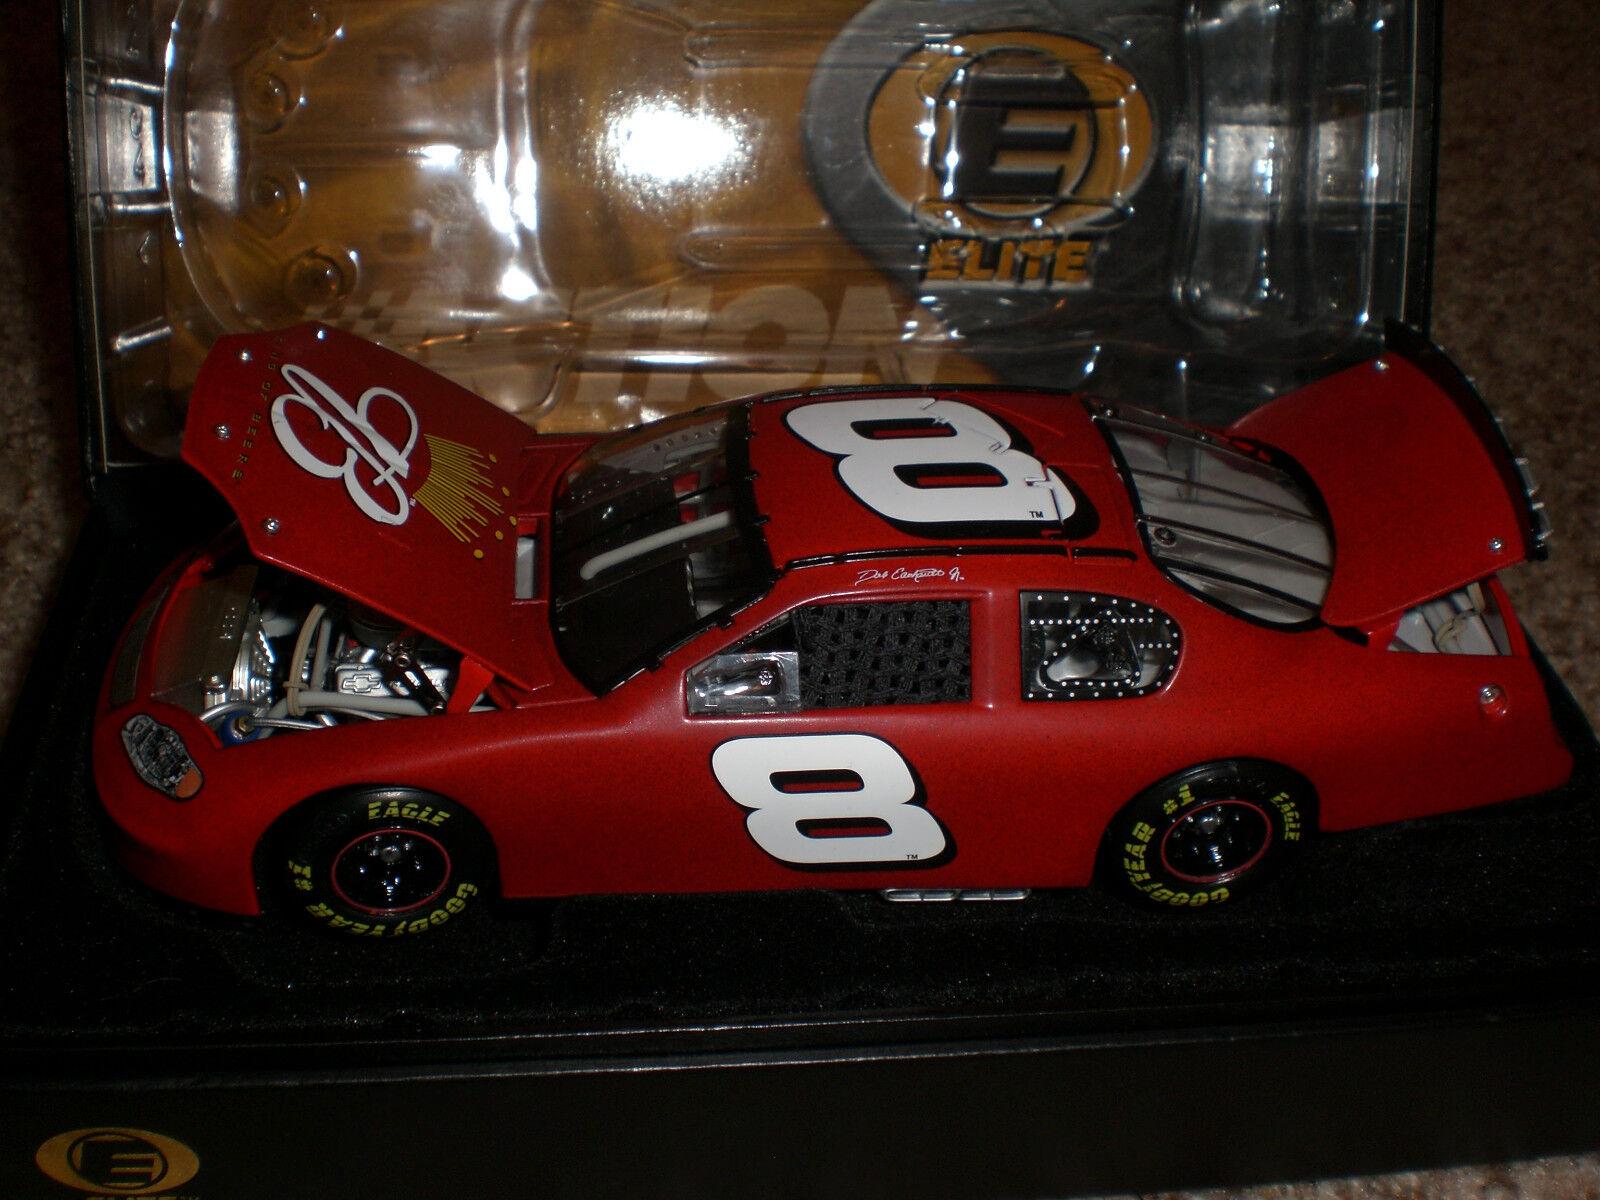 Dale Earnhardt Jr 2003  8 Budweiser Test Car RCCA Elite 1 24 RARE 4800